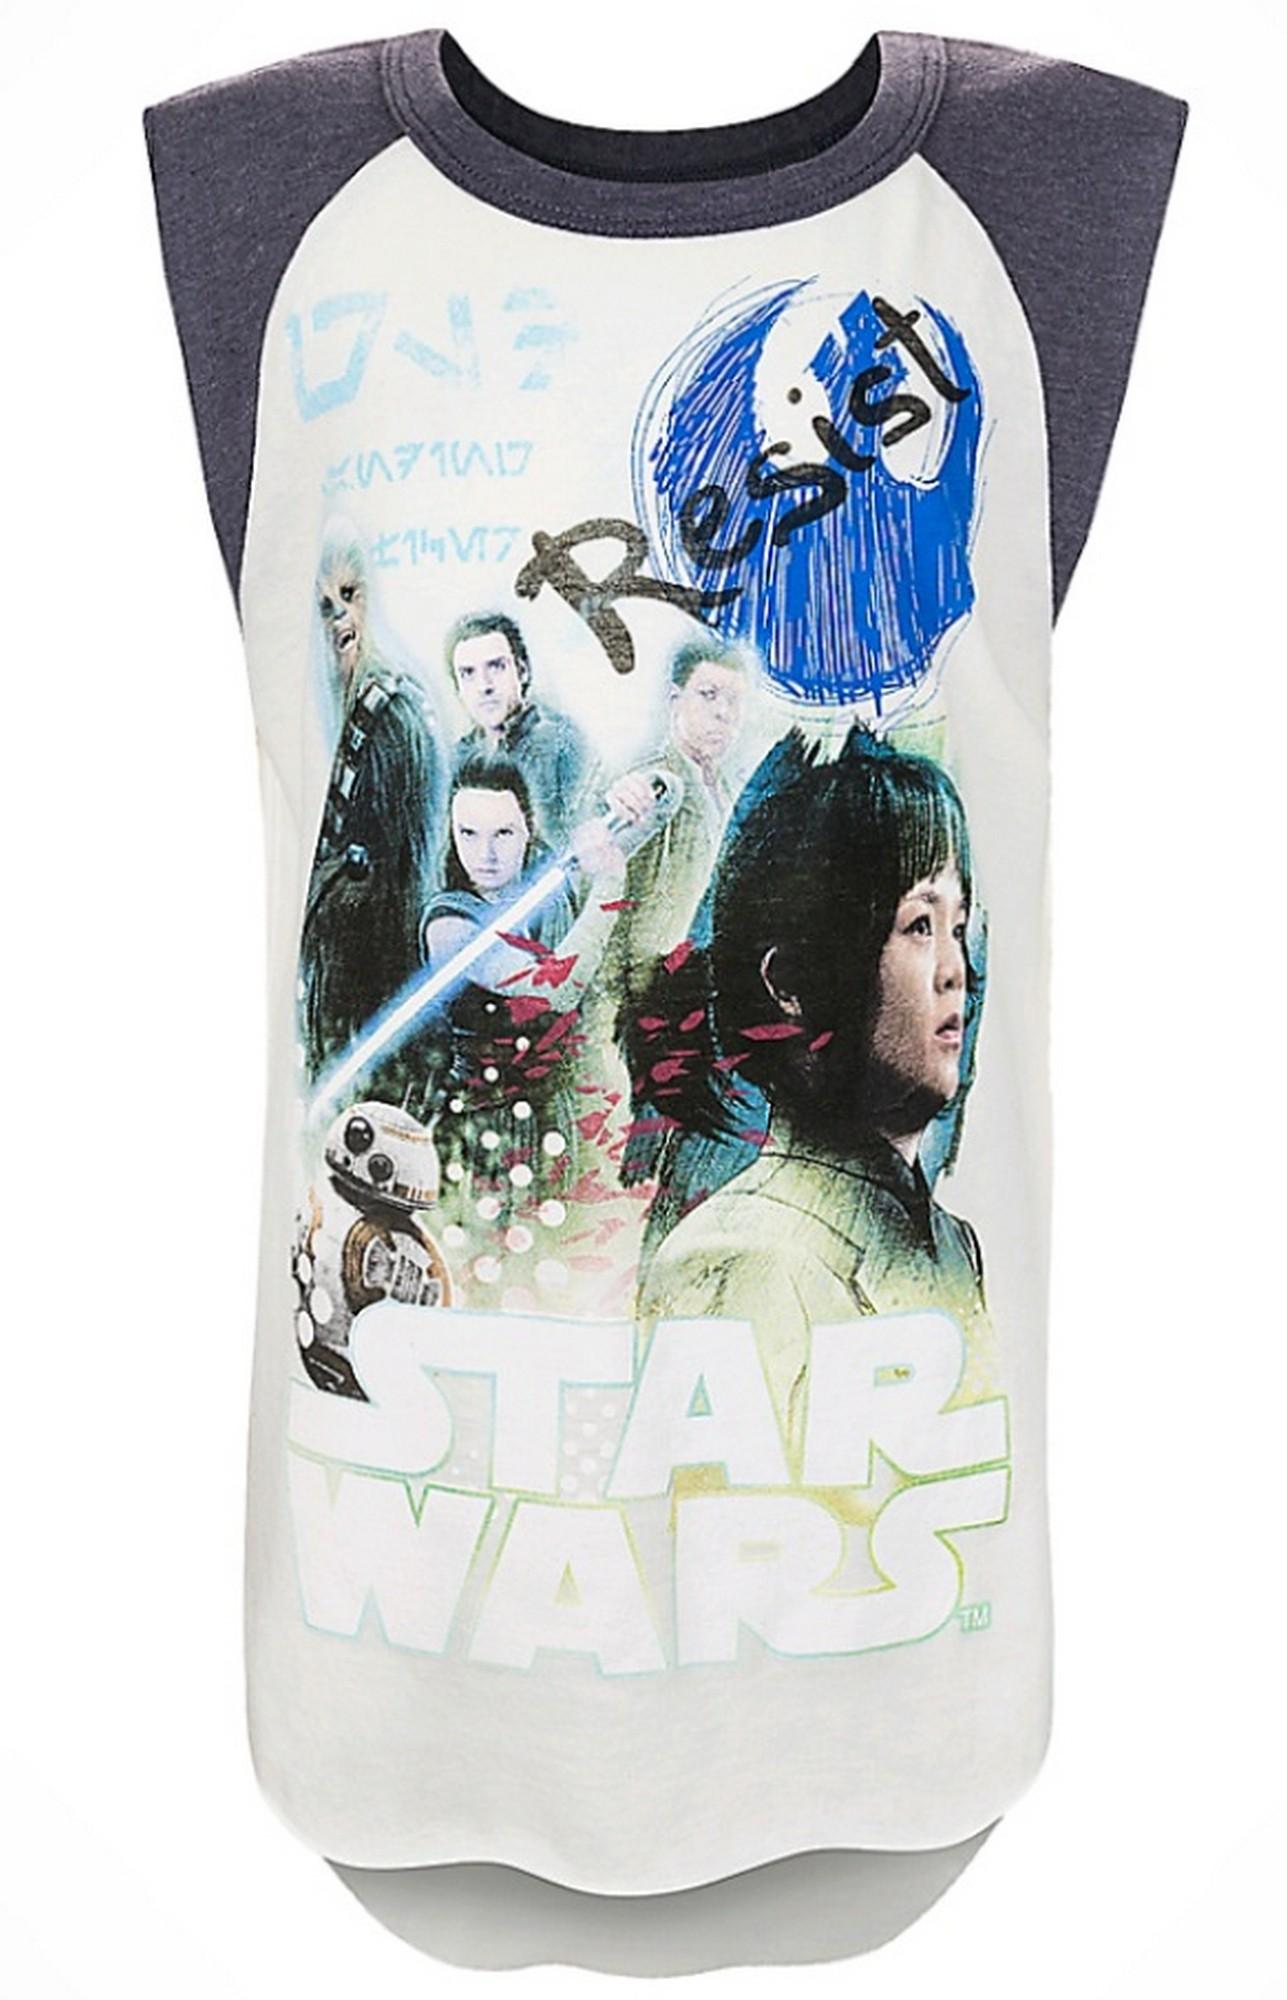 Resistance Youth Tank Tee (Tshirt, T shirt or T-Shirt) Disney Star Wars: The Last Jedi © Dizdude.com